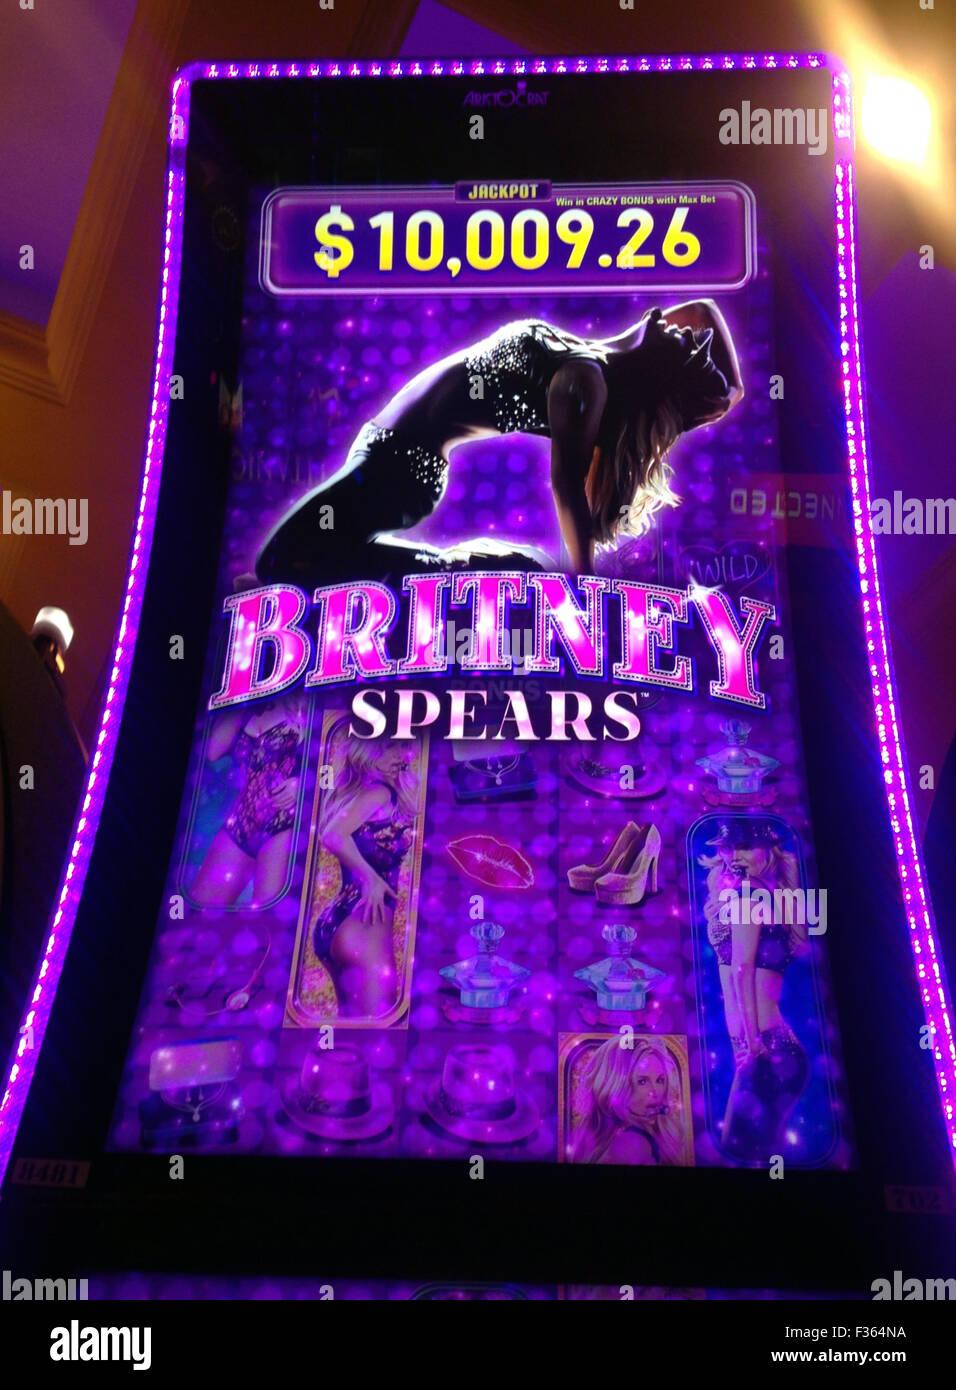 social gambling website